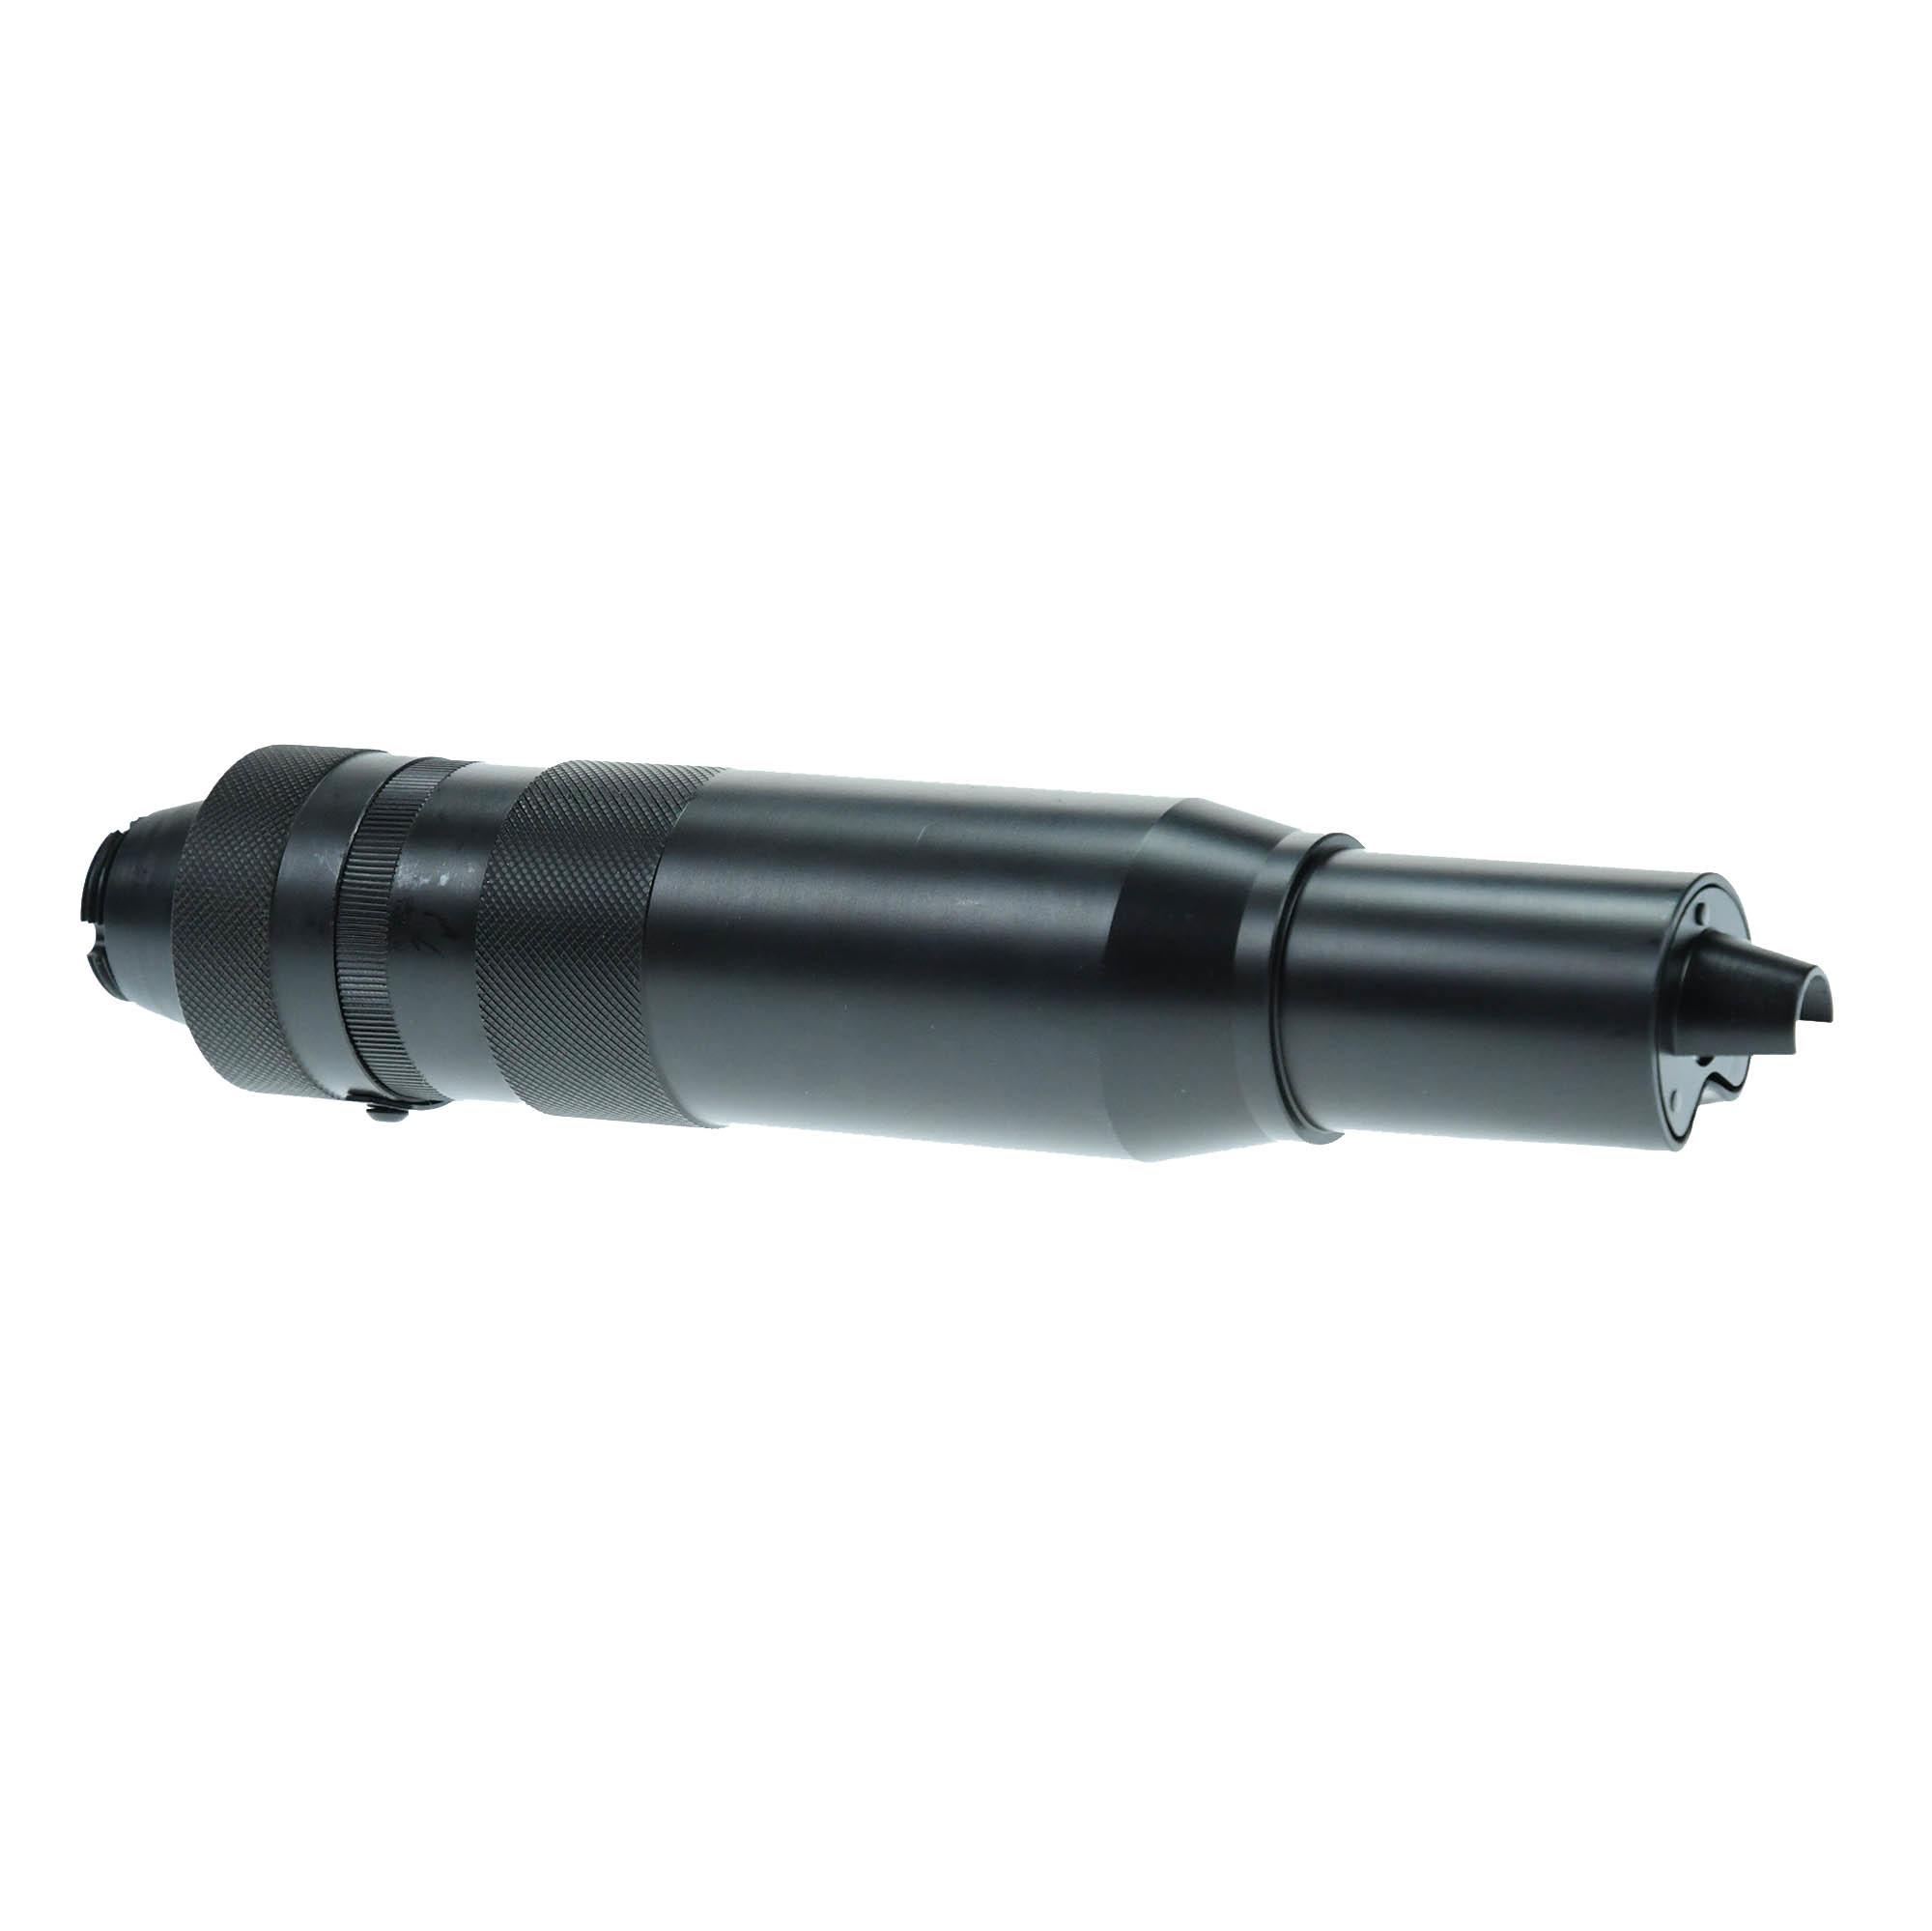 LCT PBS-4 Tracer Mock Suppressor LCT AK Serie - BK